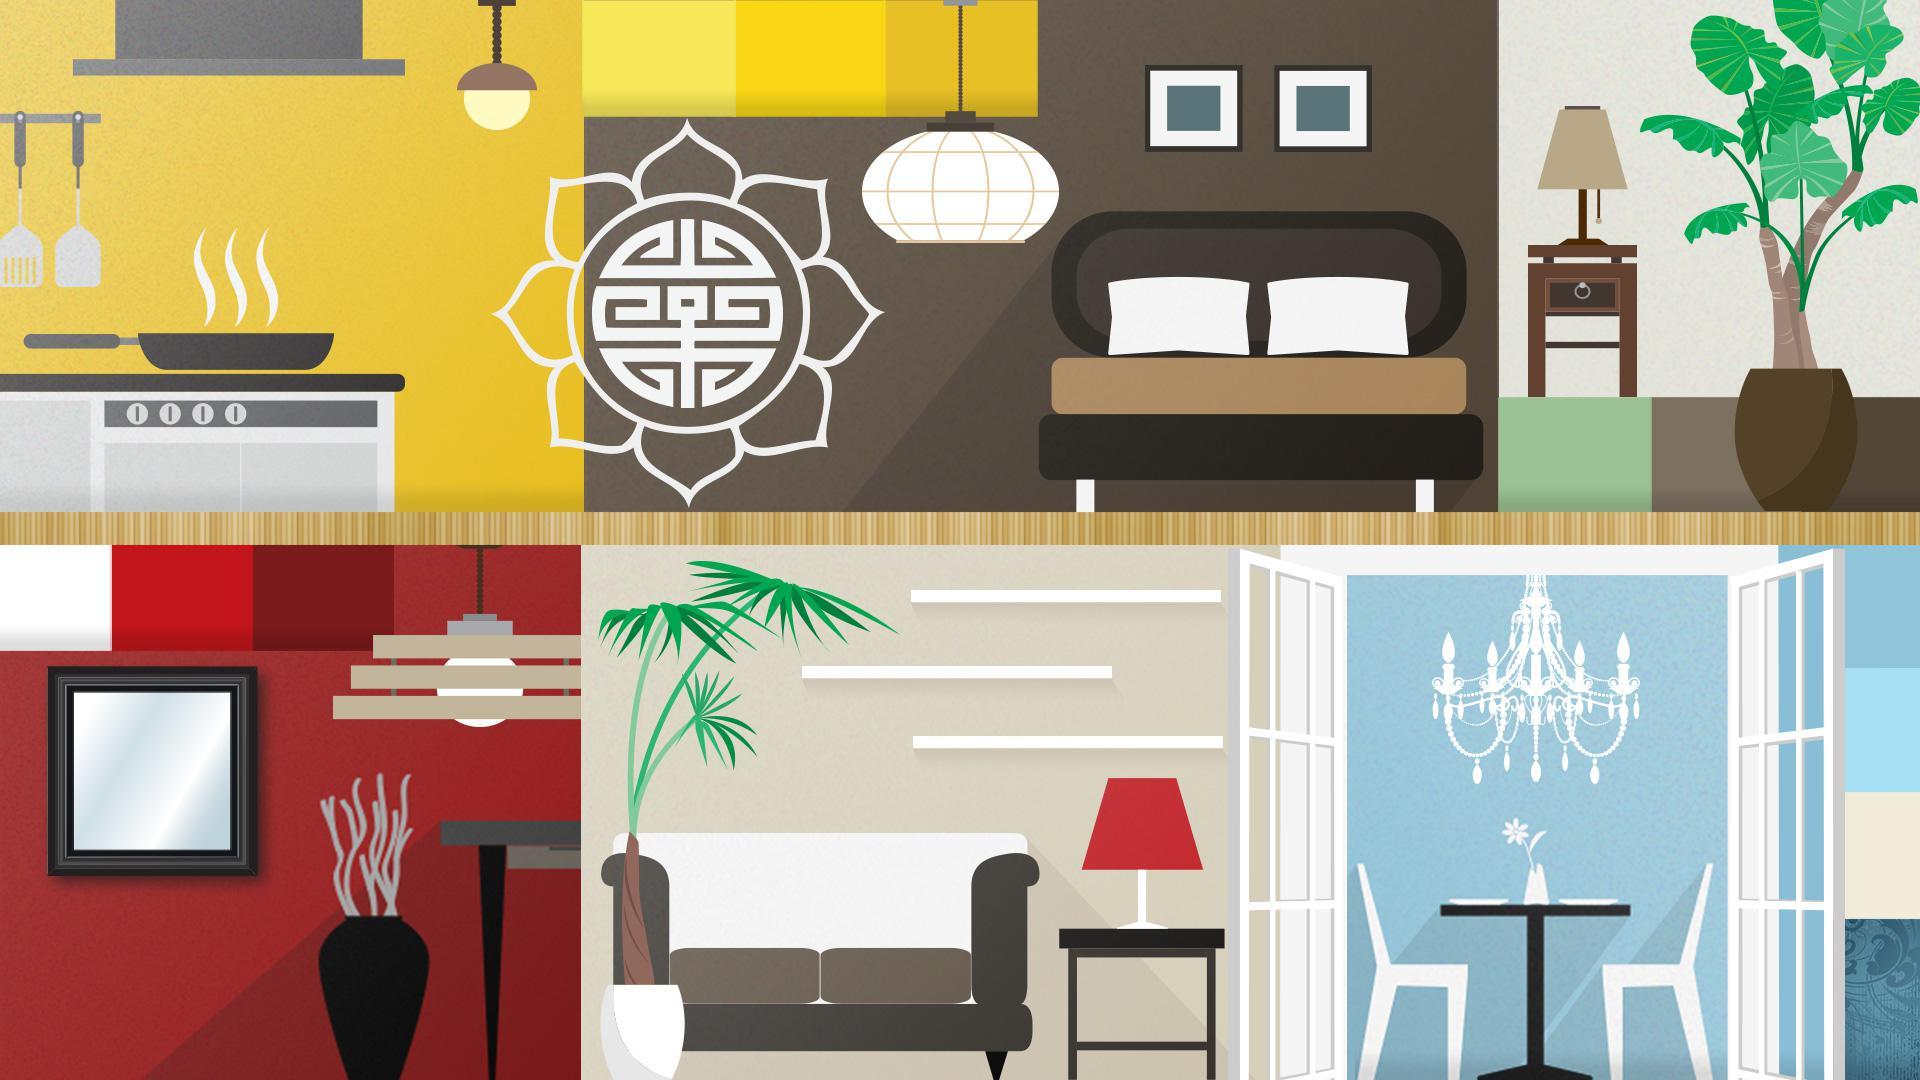 feng shui w twoim domu miniporadnik. Black Bedroom Furniture Sets. Home Design Ideas